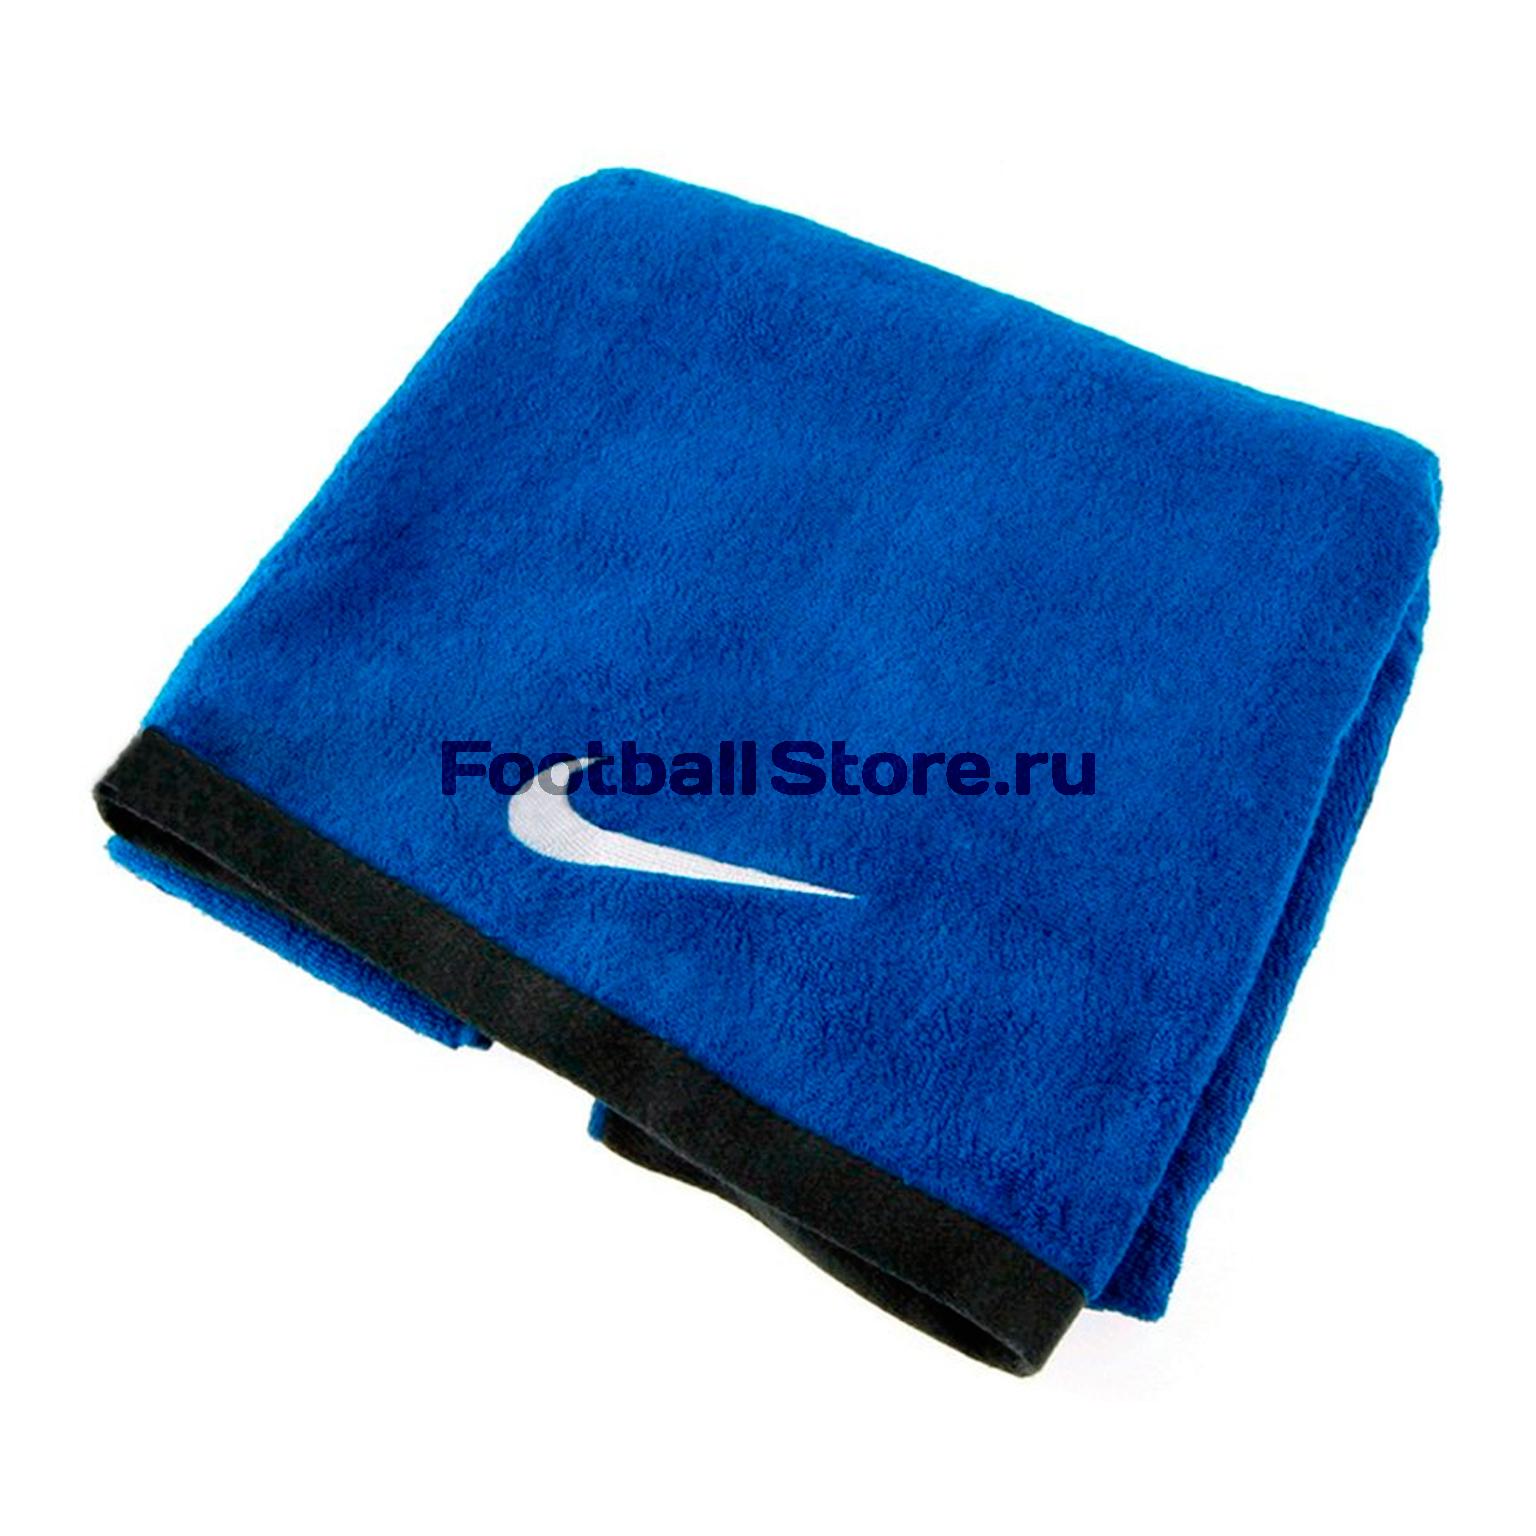 226de5f974b60f Полотенце Nike Fundamental Towel N.E.T.17.452.LG – купить в интернет  магазине footballstore, цена, фото